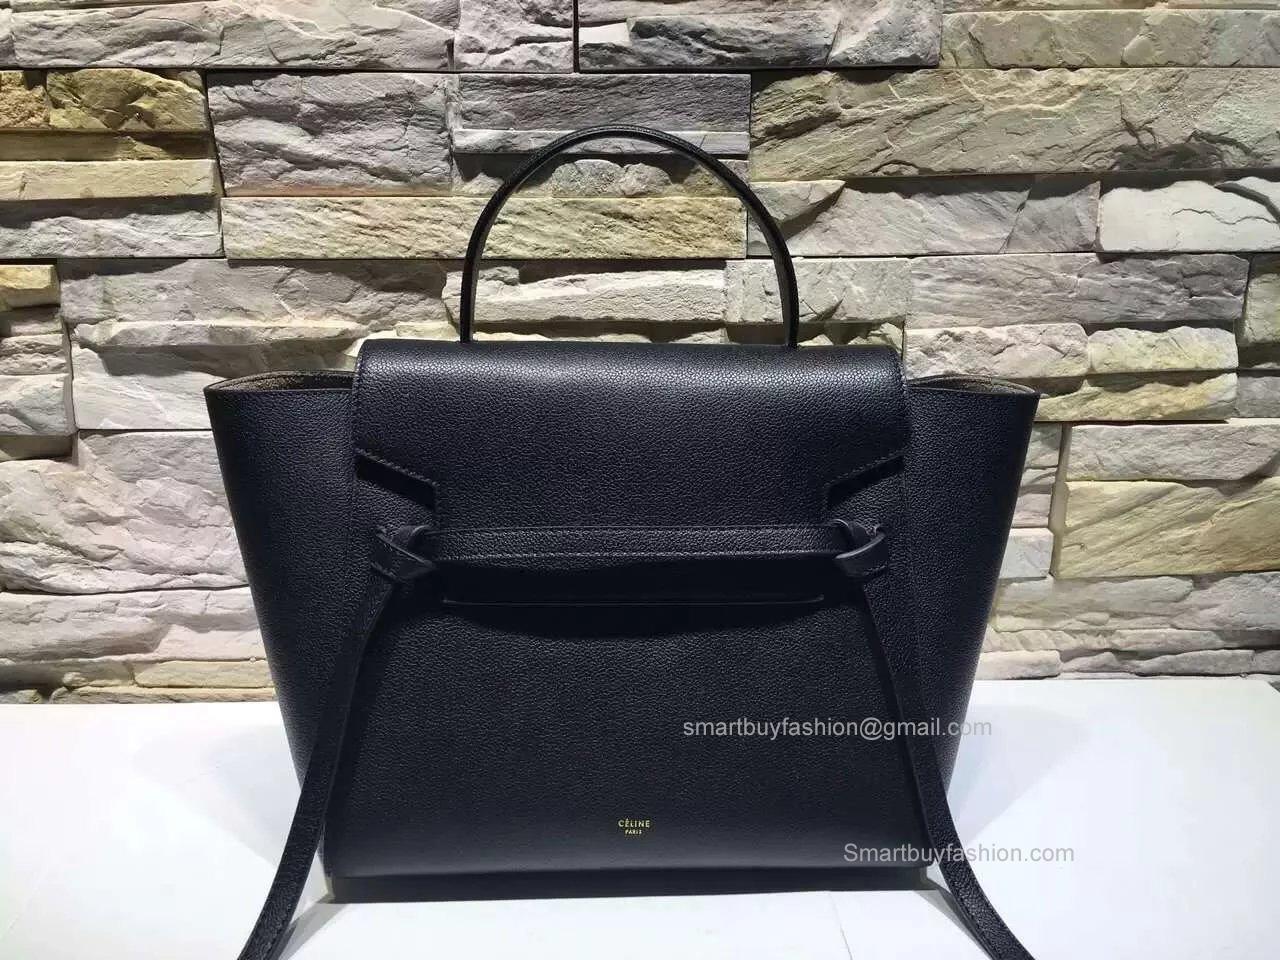 3bb40fe10150 Replica Celine Mini Belt Bag in Black Baby Grained Leather ...